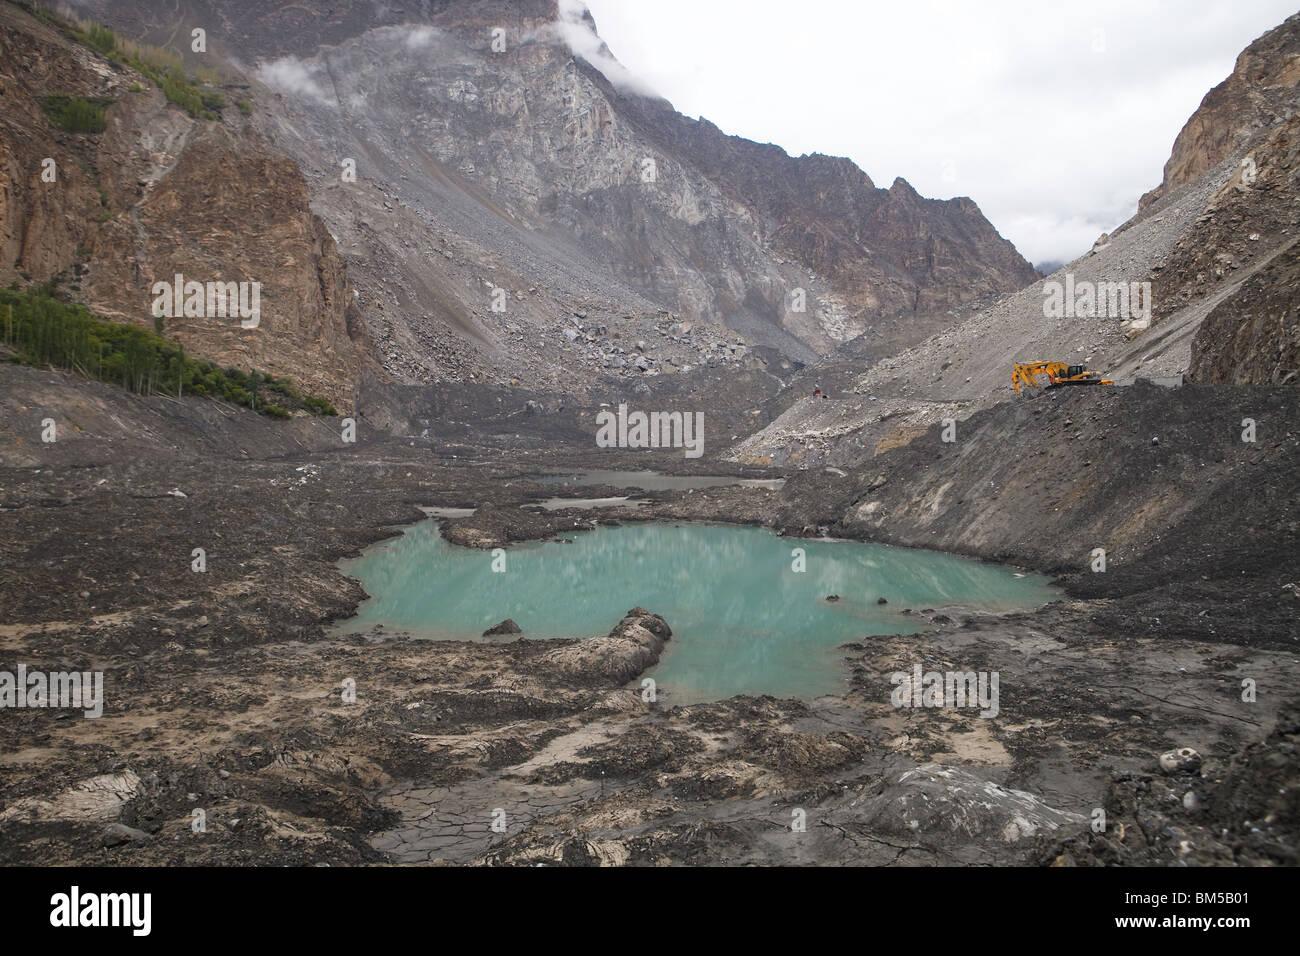 The landslide area at Attabad which blocks the Karakoram Highway, Hunza, Pakistan - Stock Image